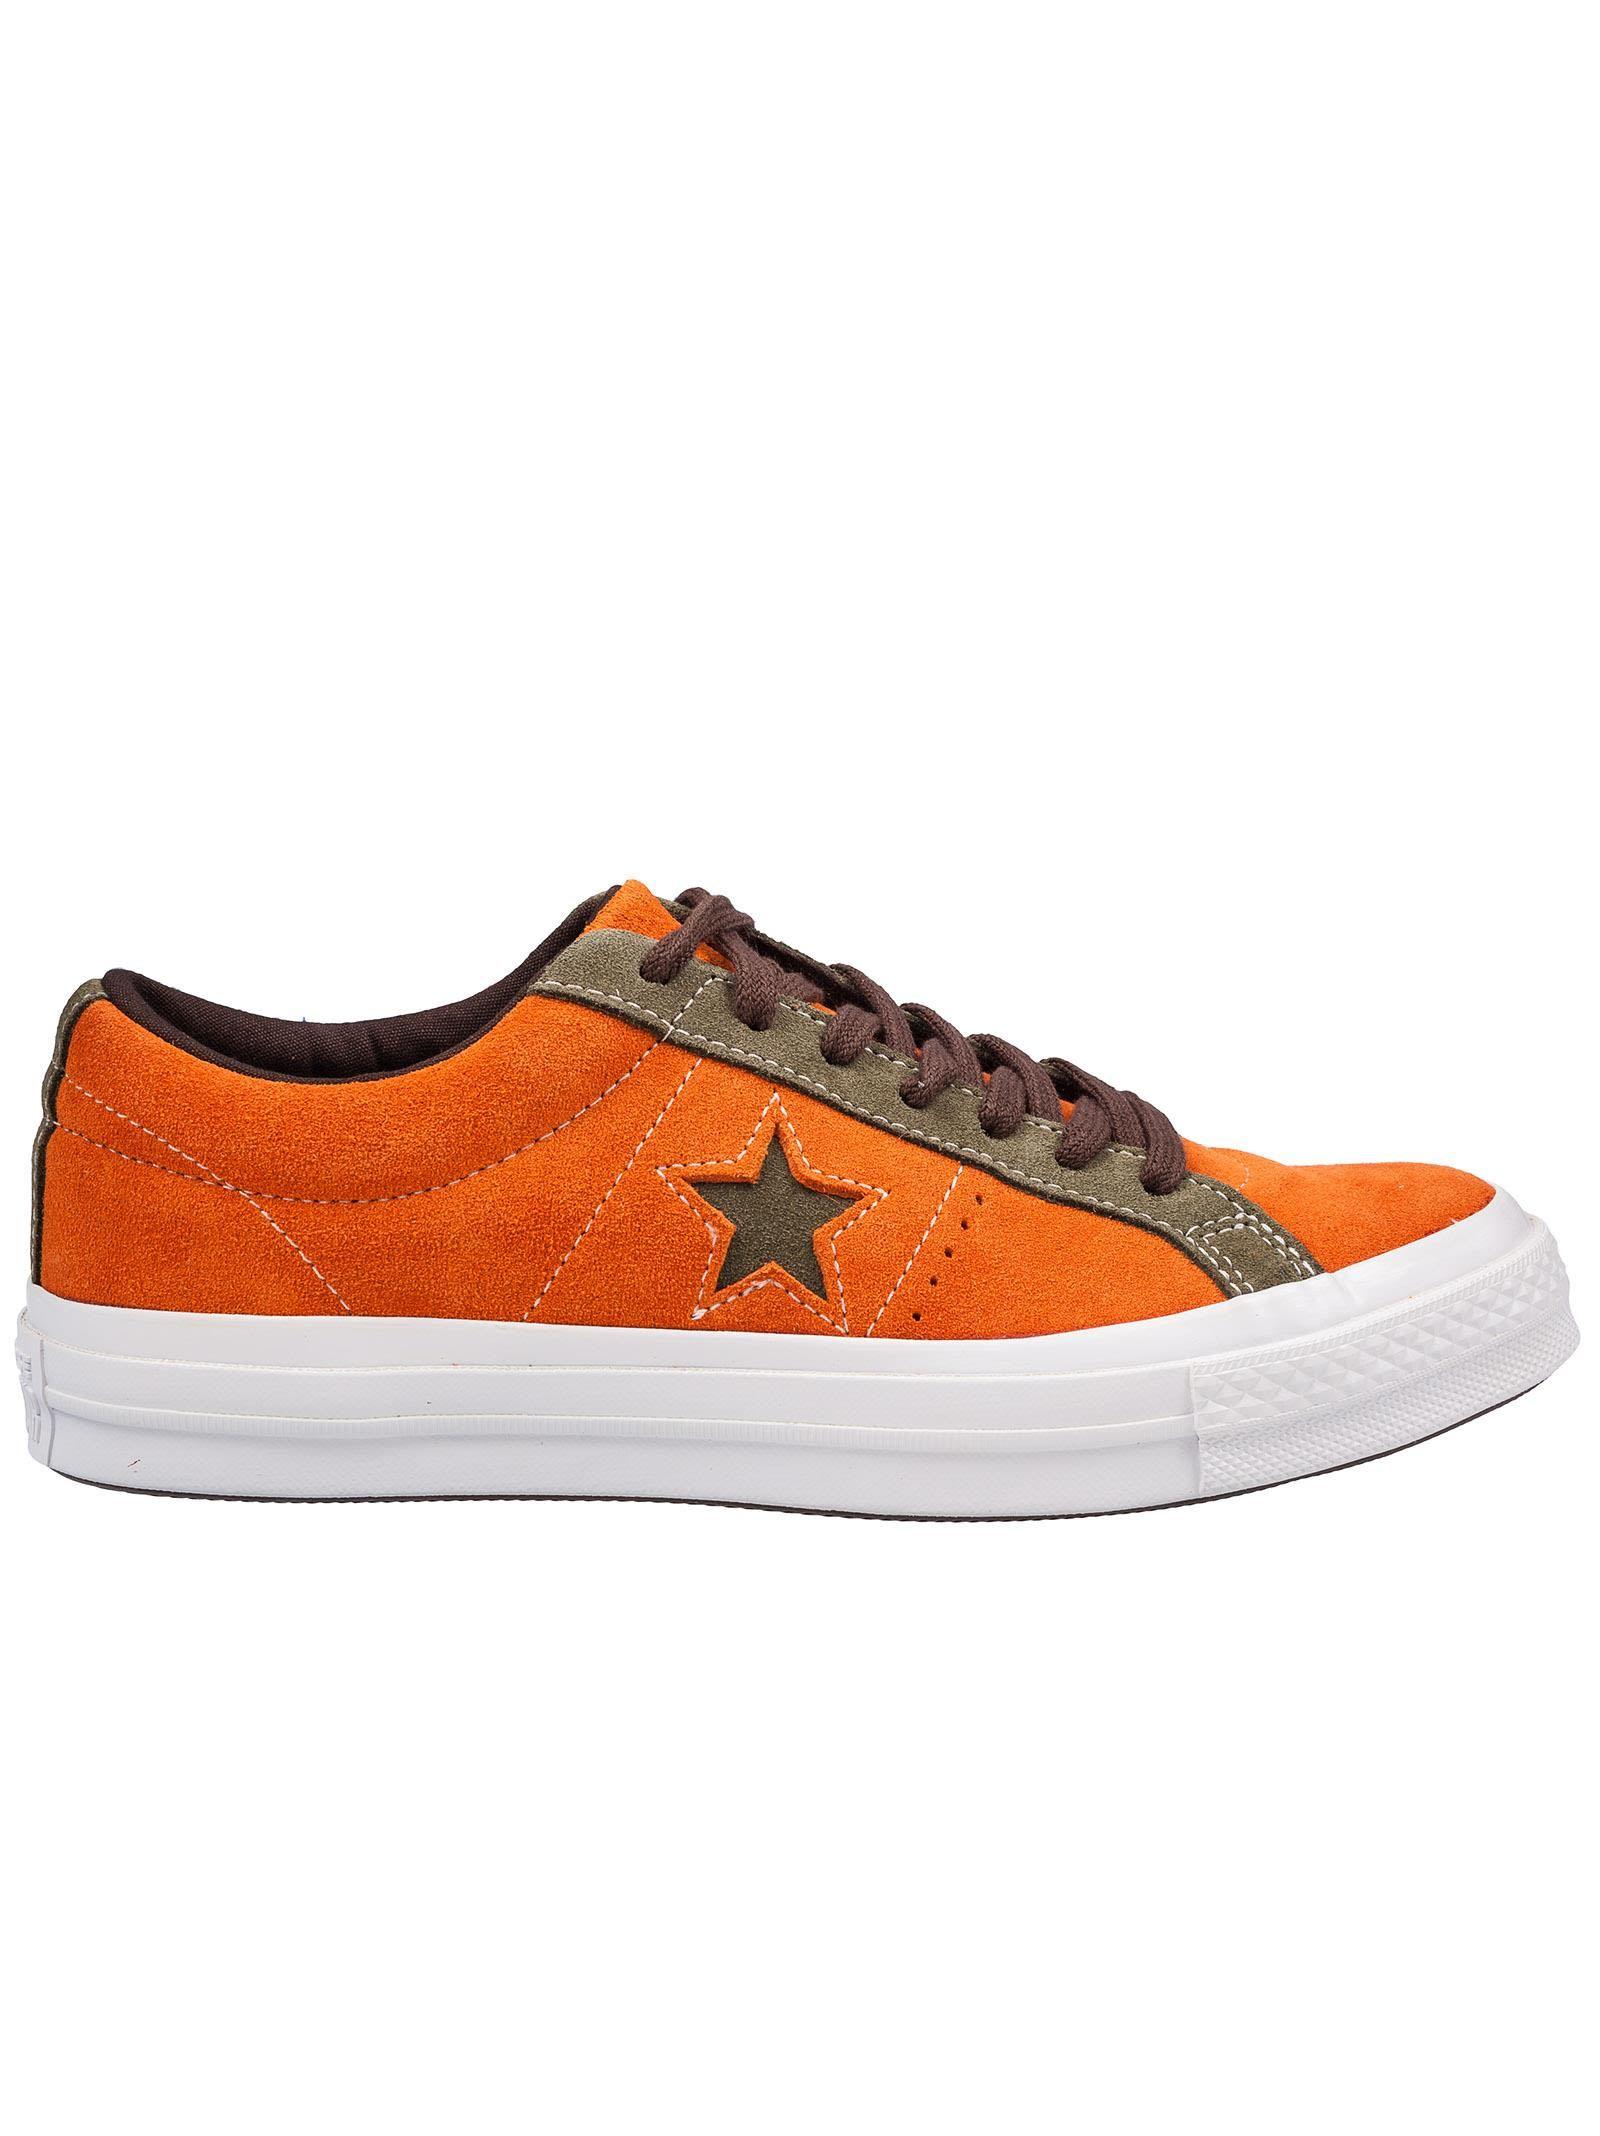 525d716c21f CONVERSE One Star - Corduroy Ox